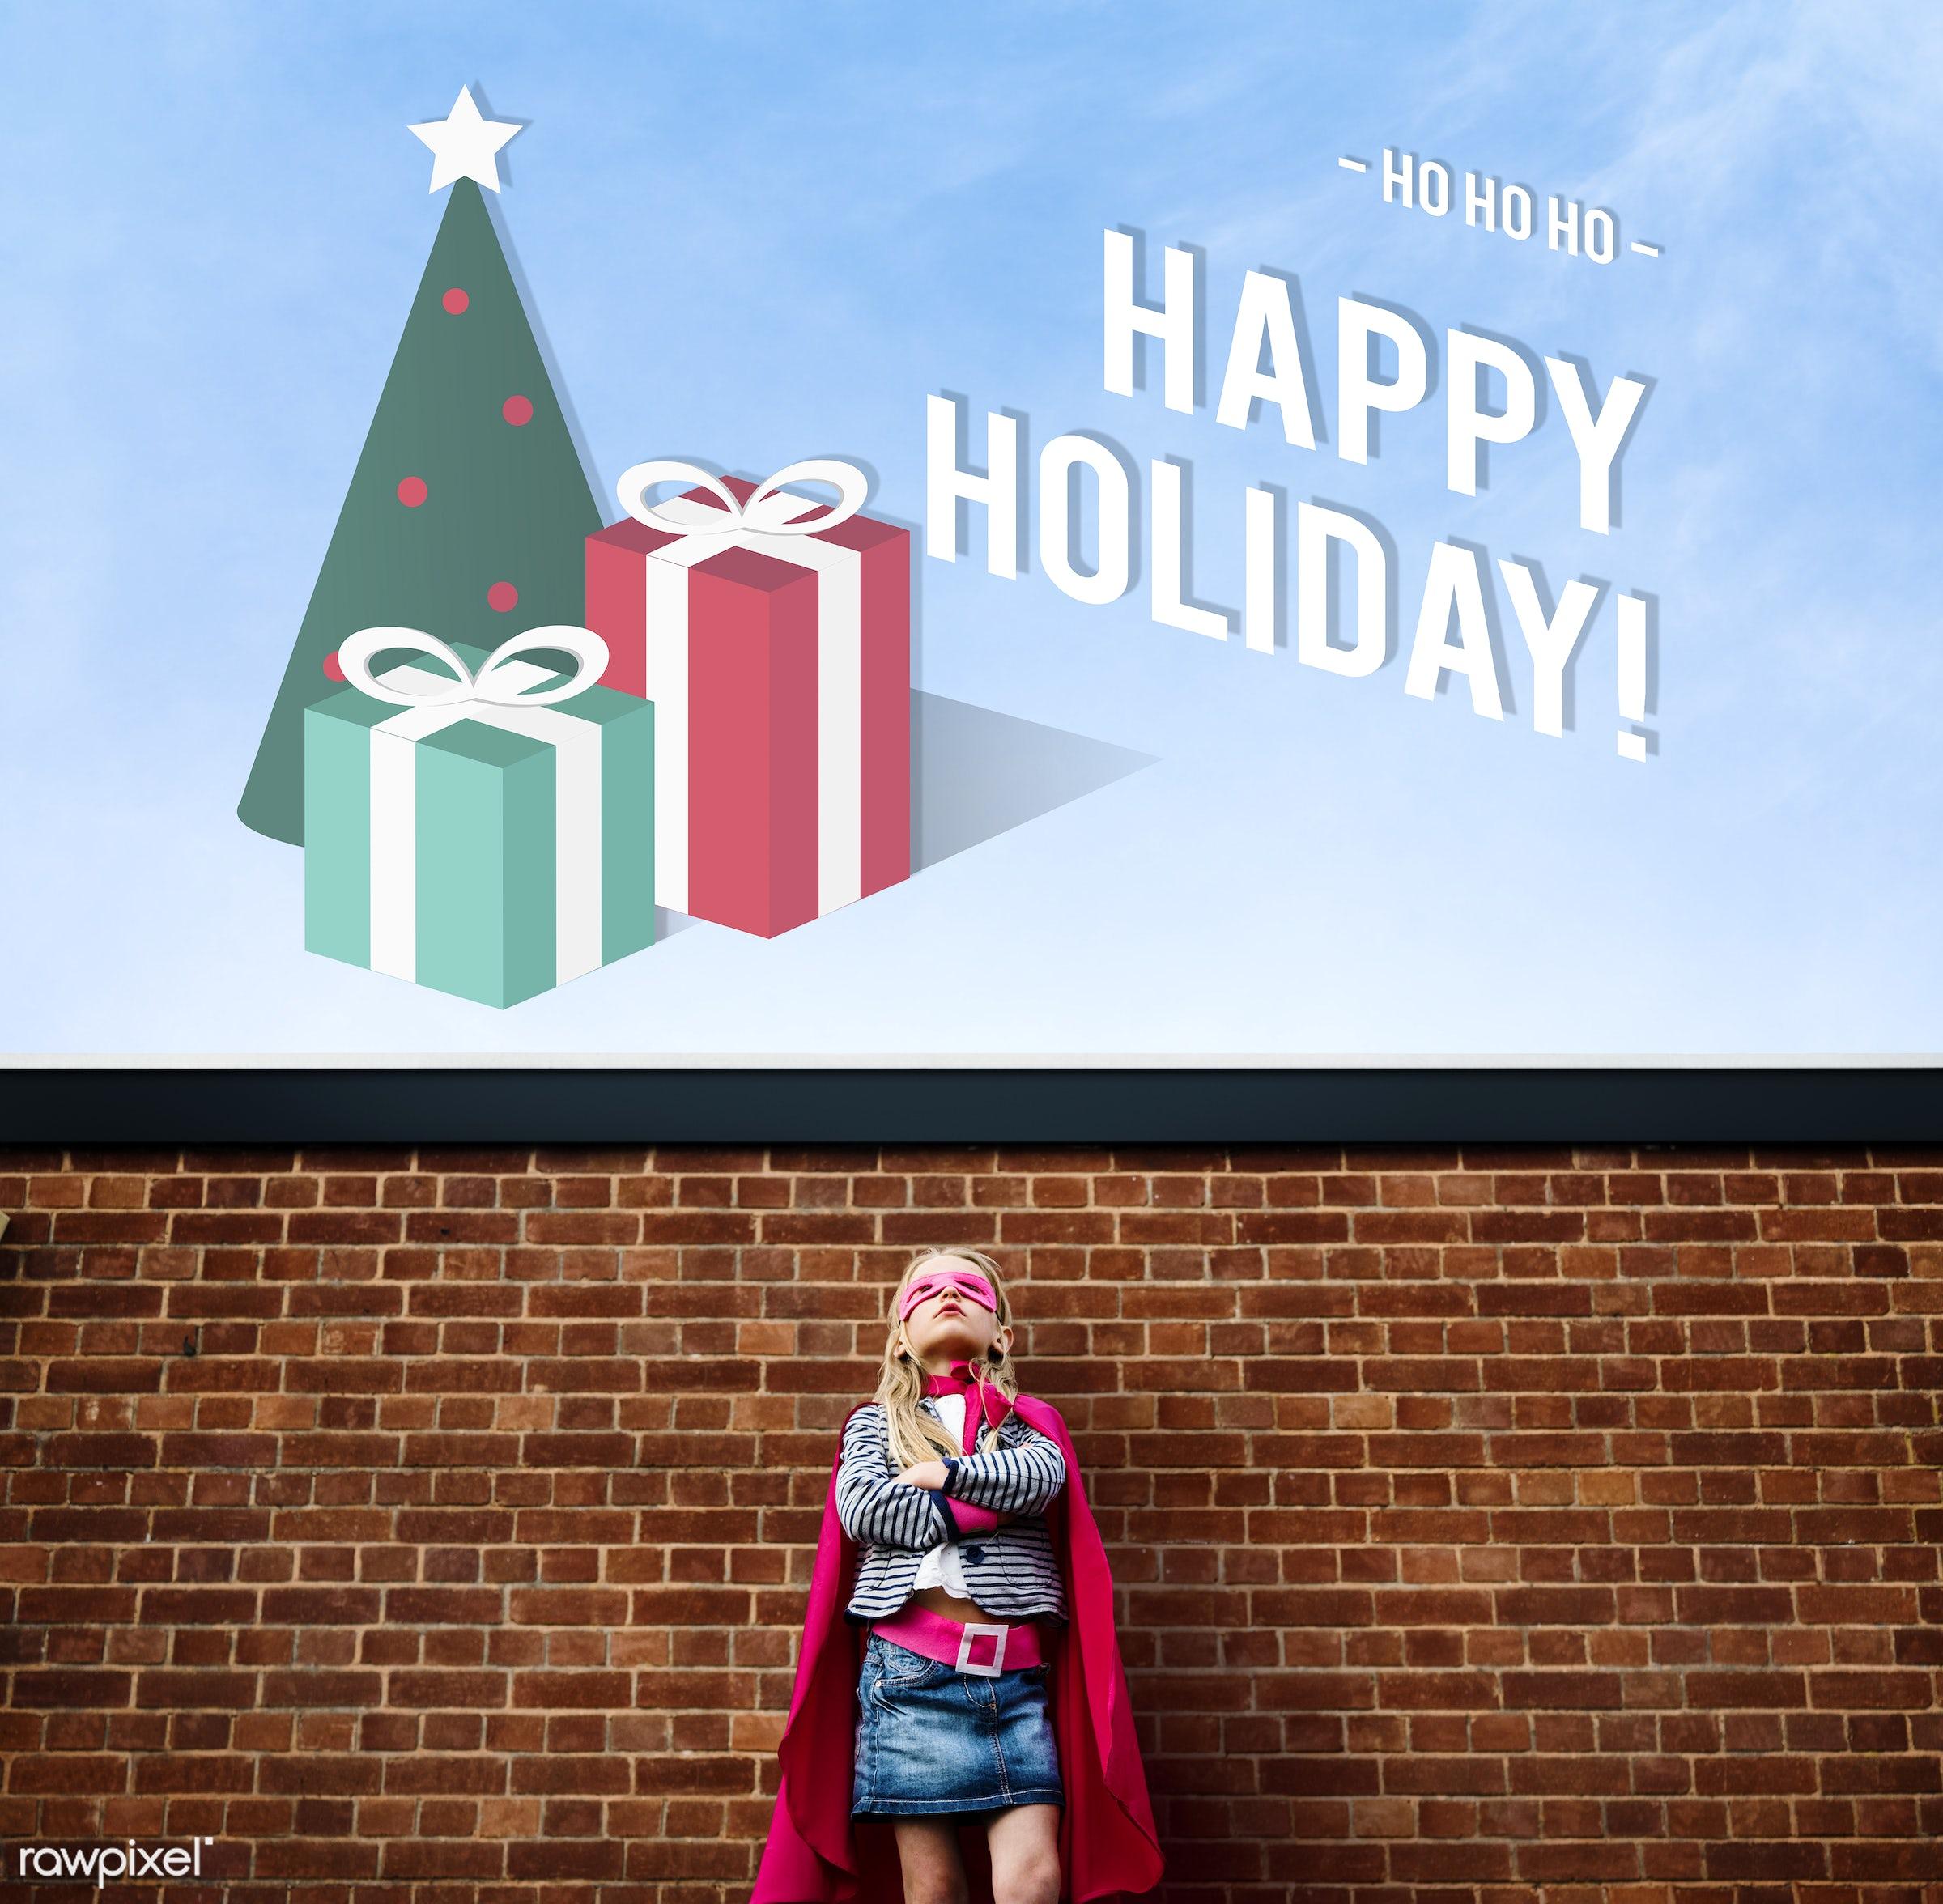 active, best wishes, brave, celebration, child, childhood, christmas, confetti, costume, decoration, dream, dressed up, gift...